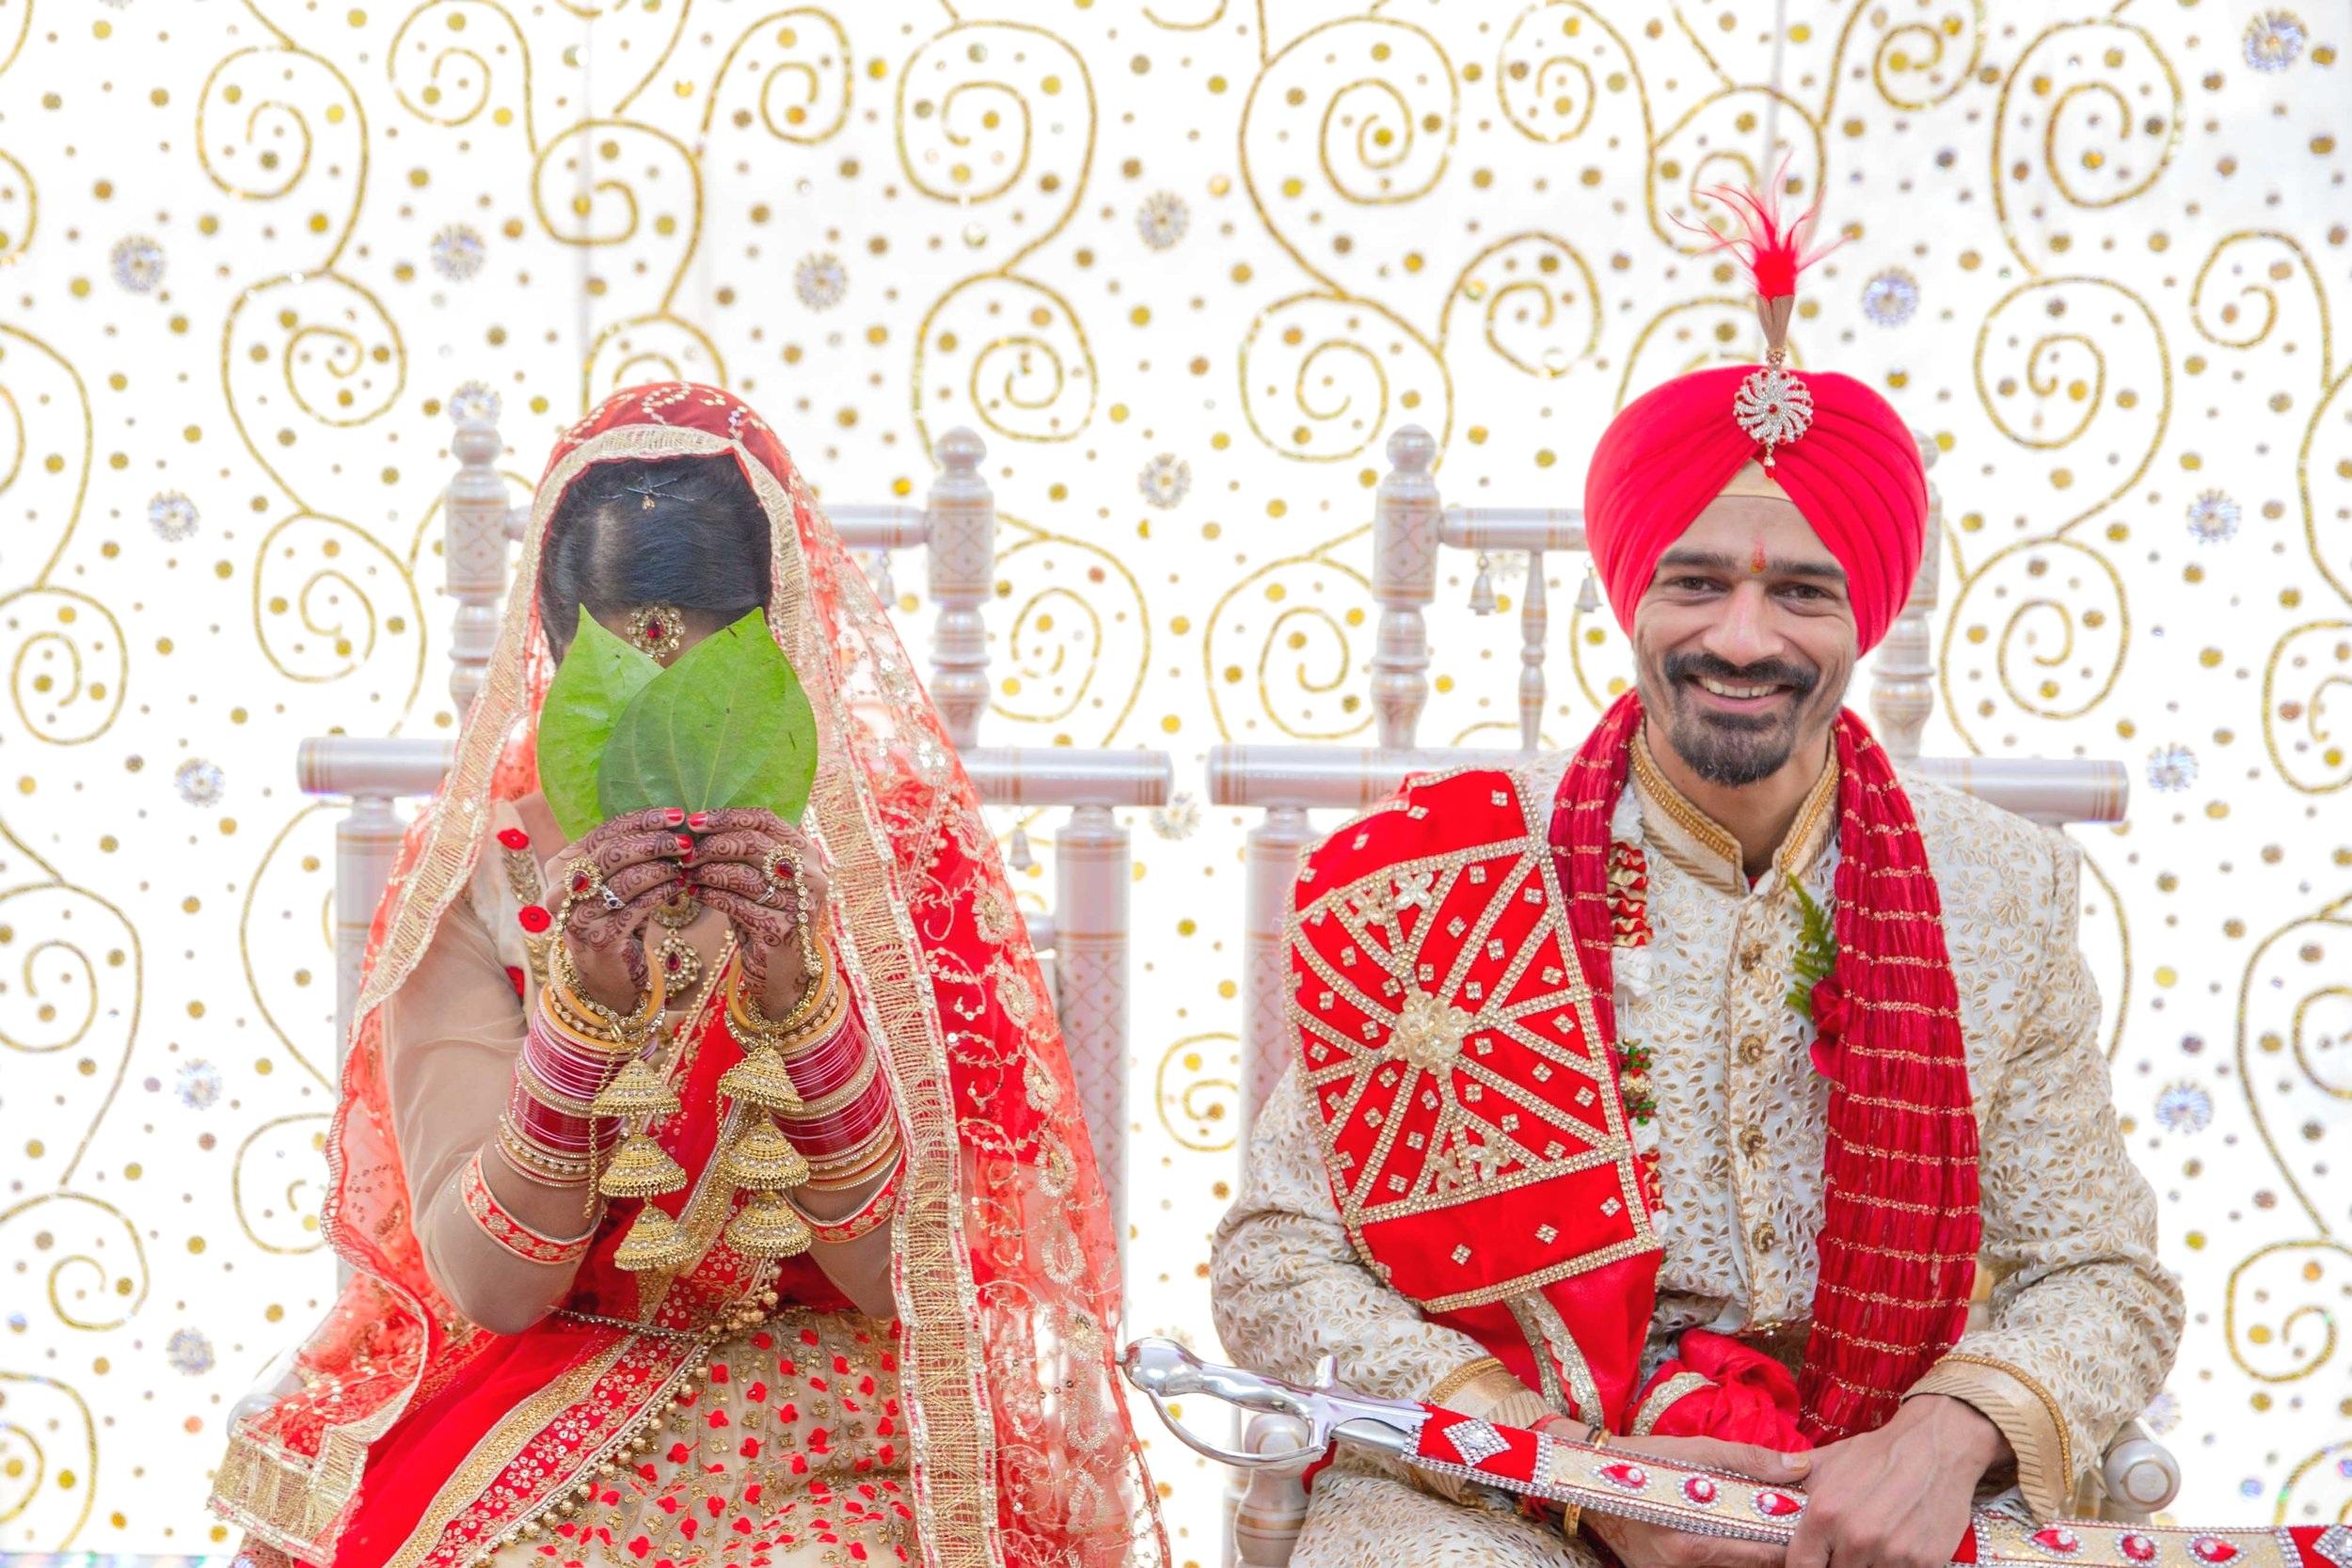 ramada-park-hall-hotel-birmingham-wolverhampton-hindu-wedding-asian-wedding-photography-natalia-smith-photography-21+%281%29.jpg